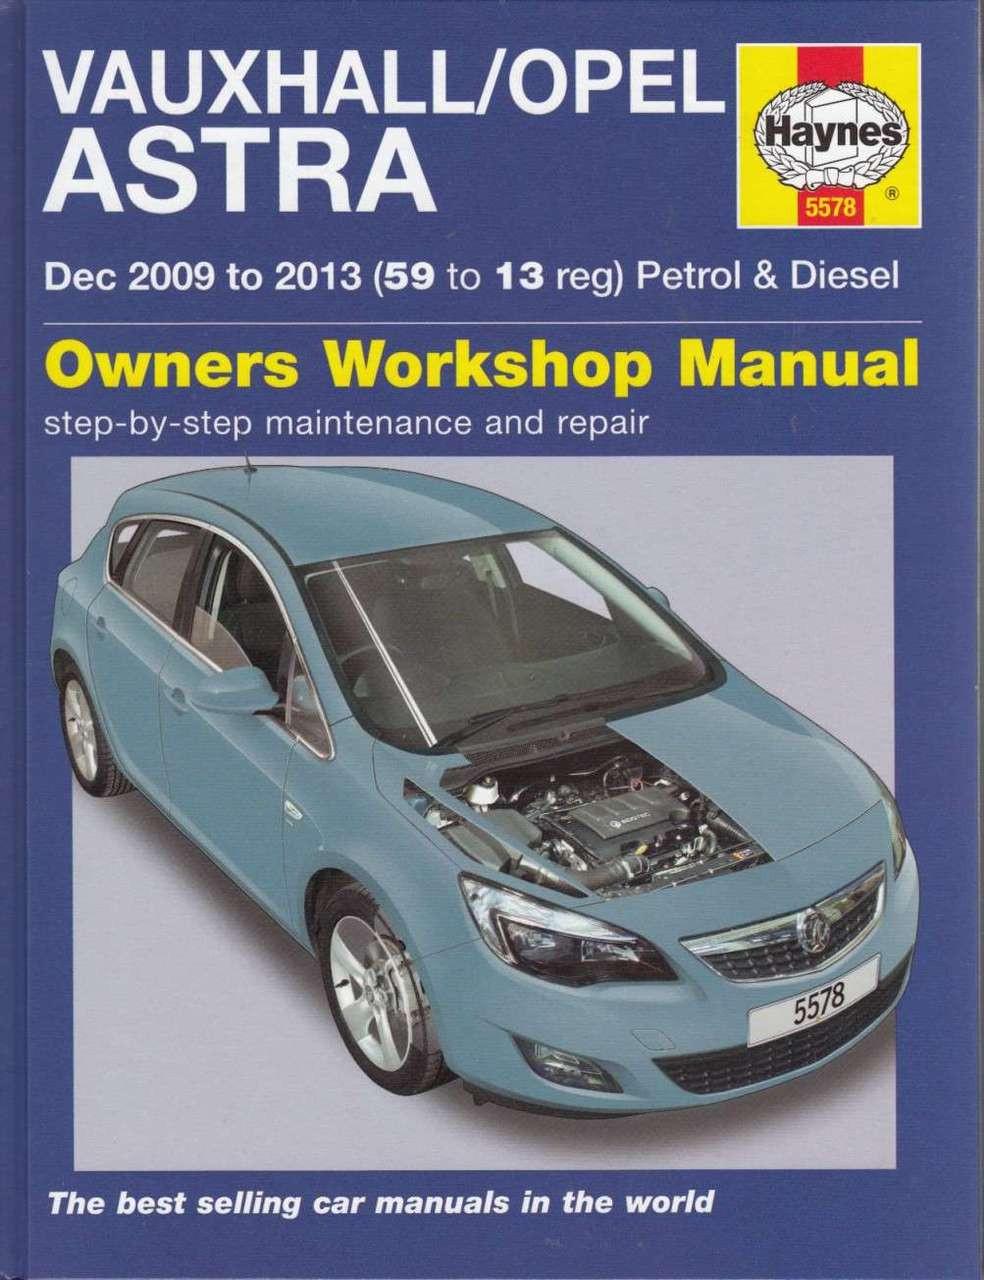 manual opel astra 2012